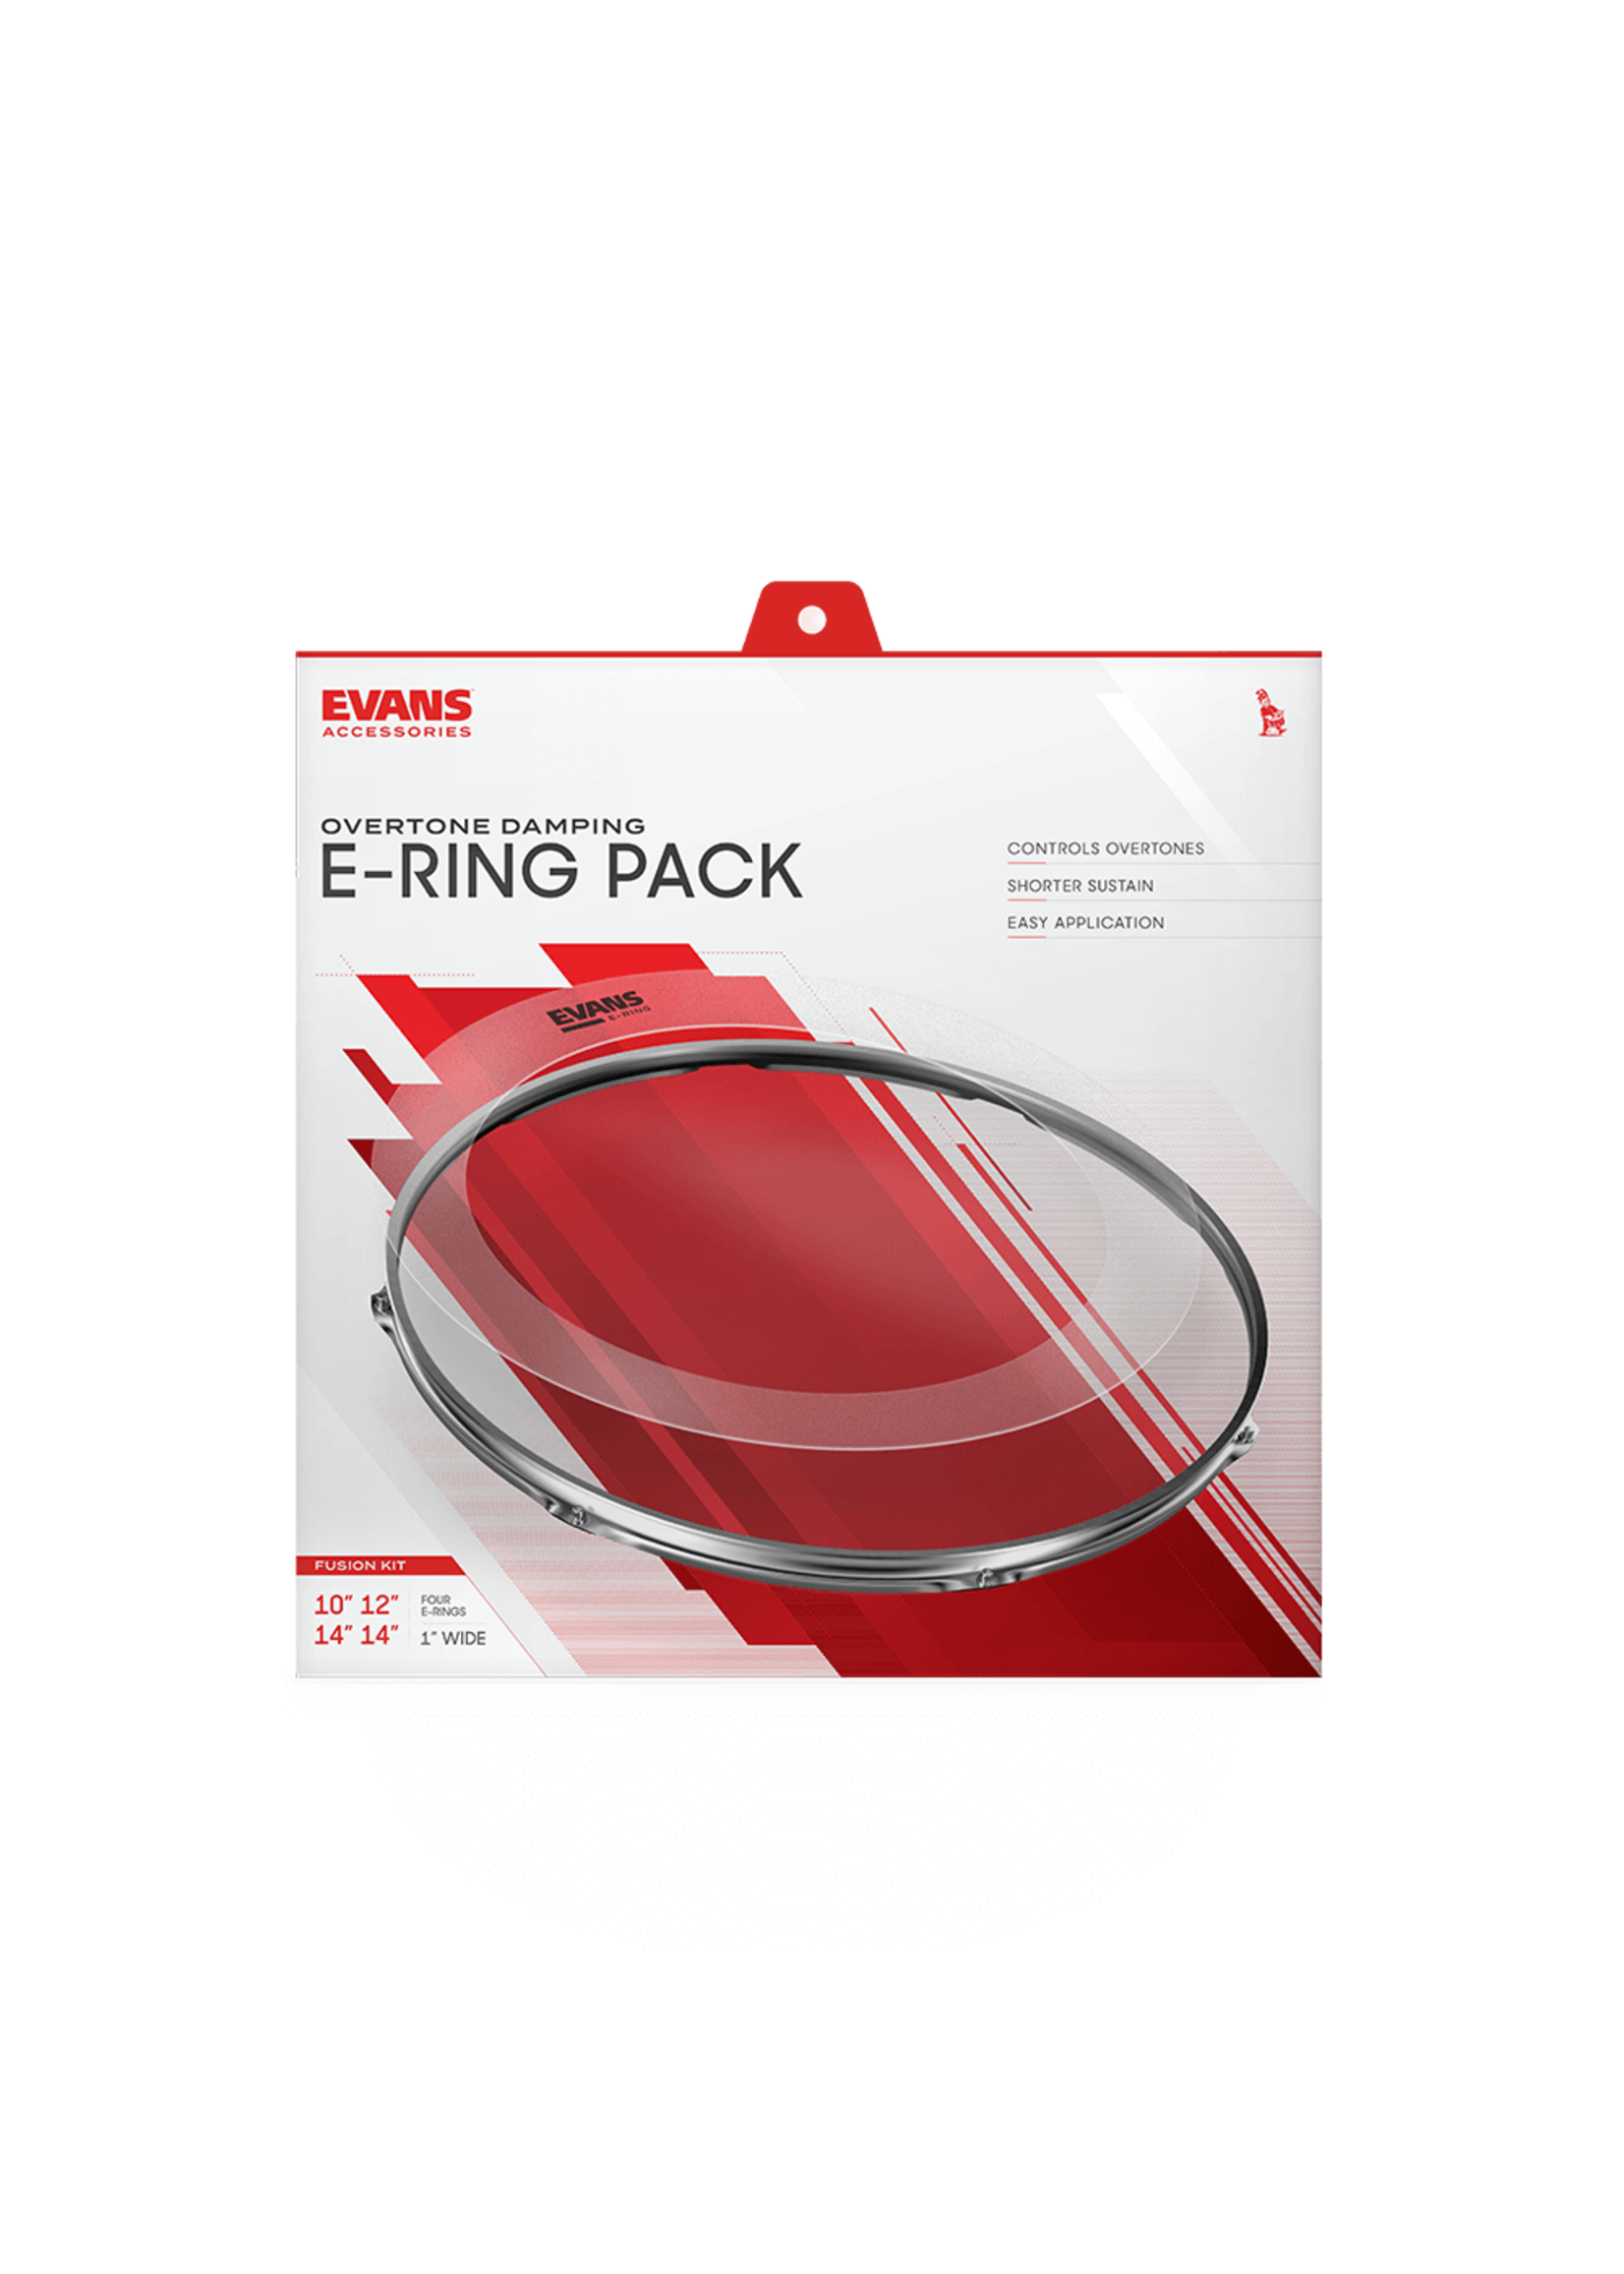 "Evans Accessories E-RING 10-12-14-14"" FUS PACK"